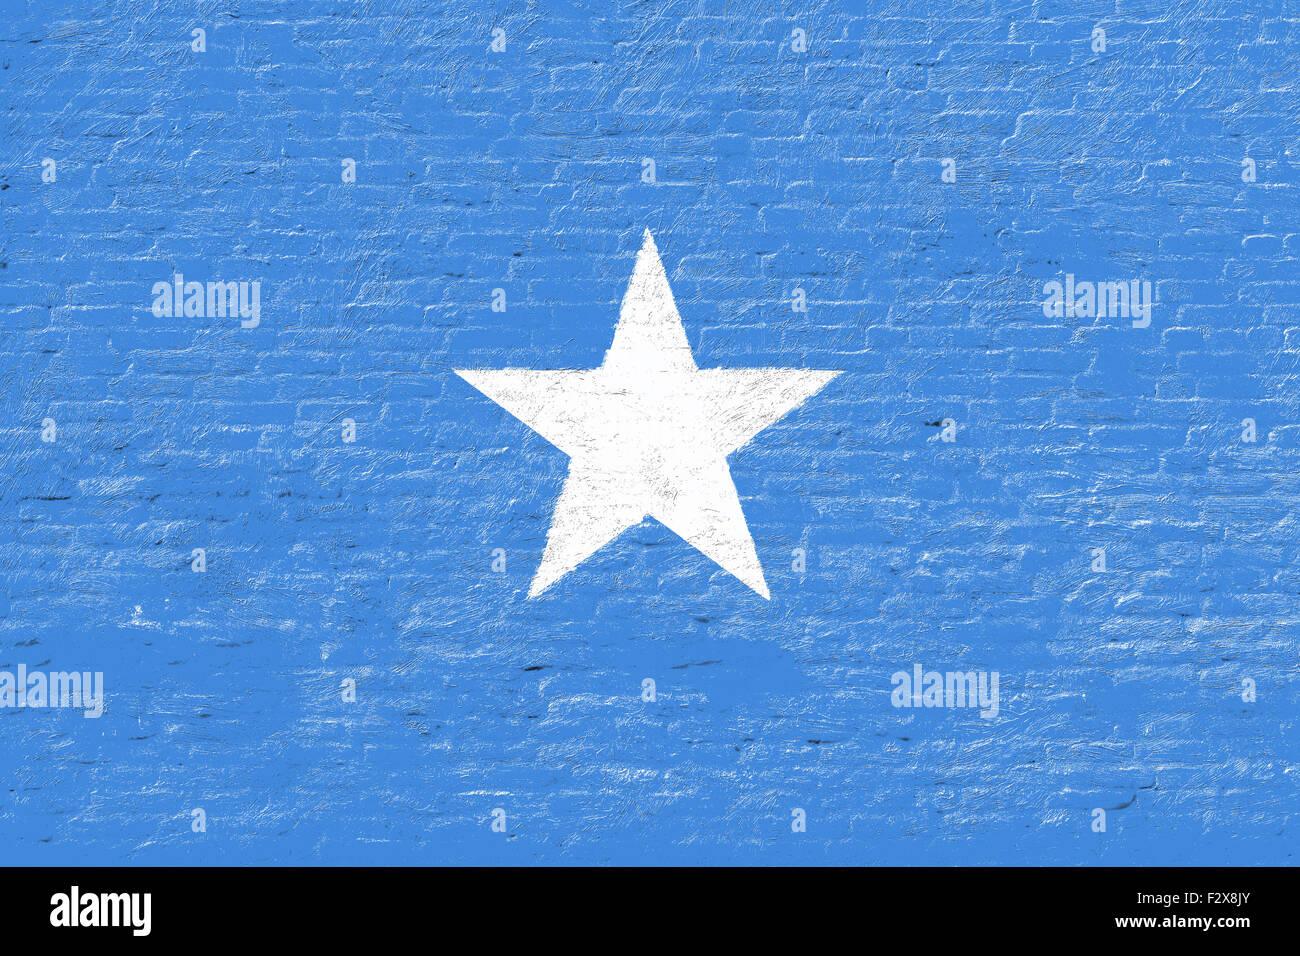 Somalia - National flag on Brick wall Stock Photo